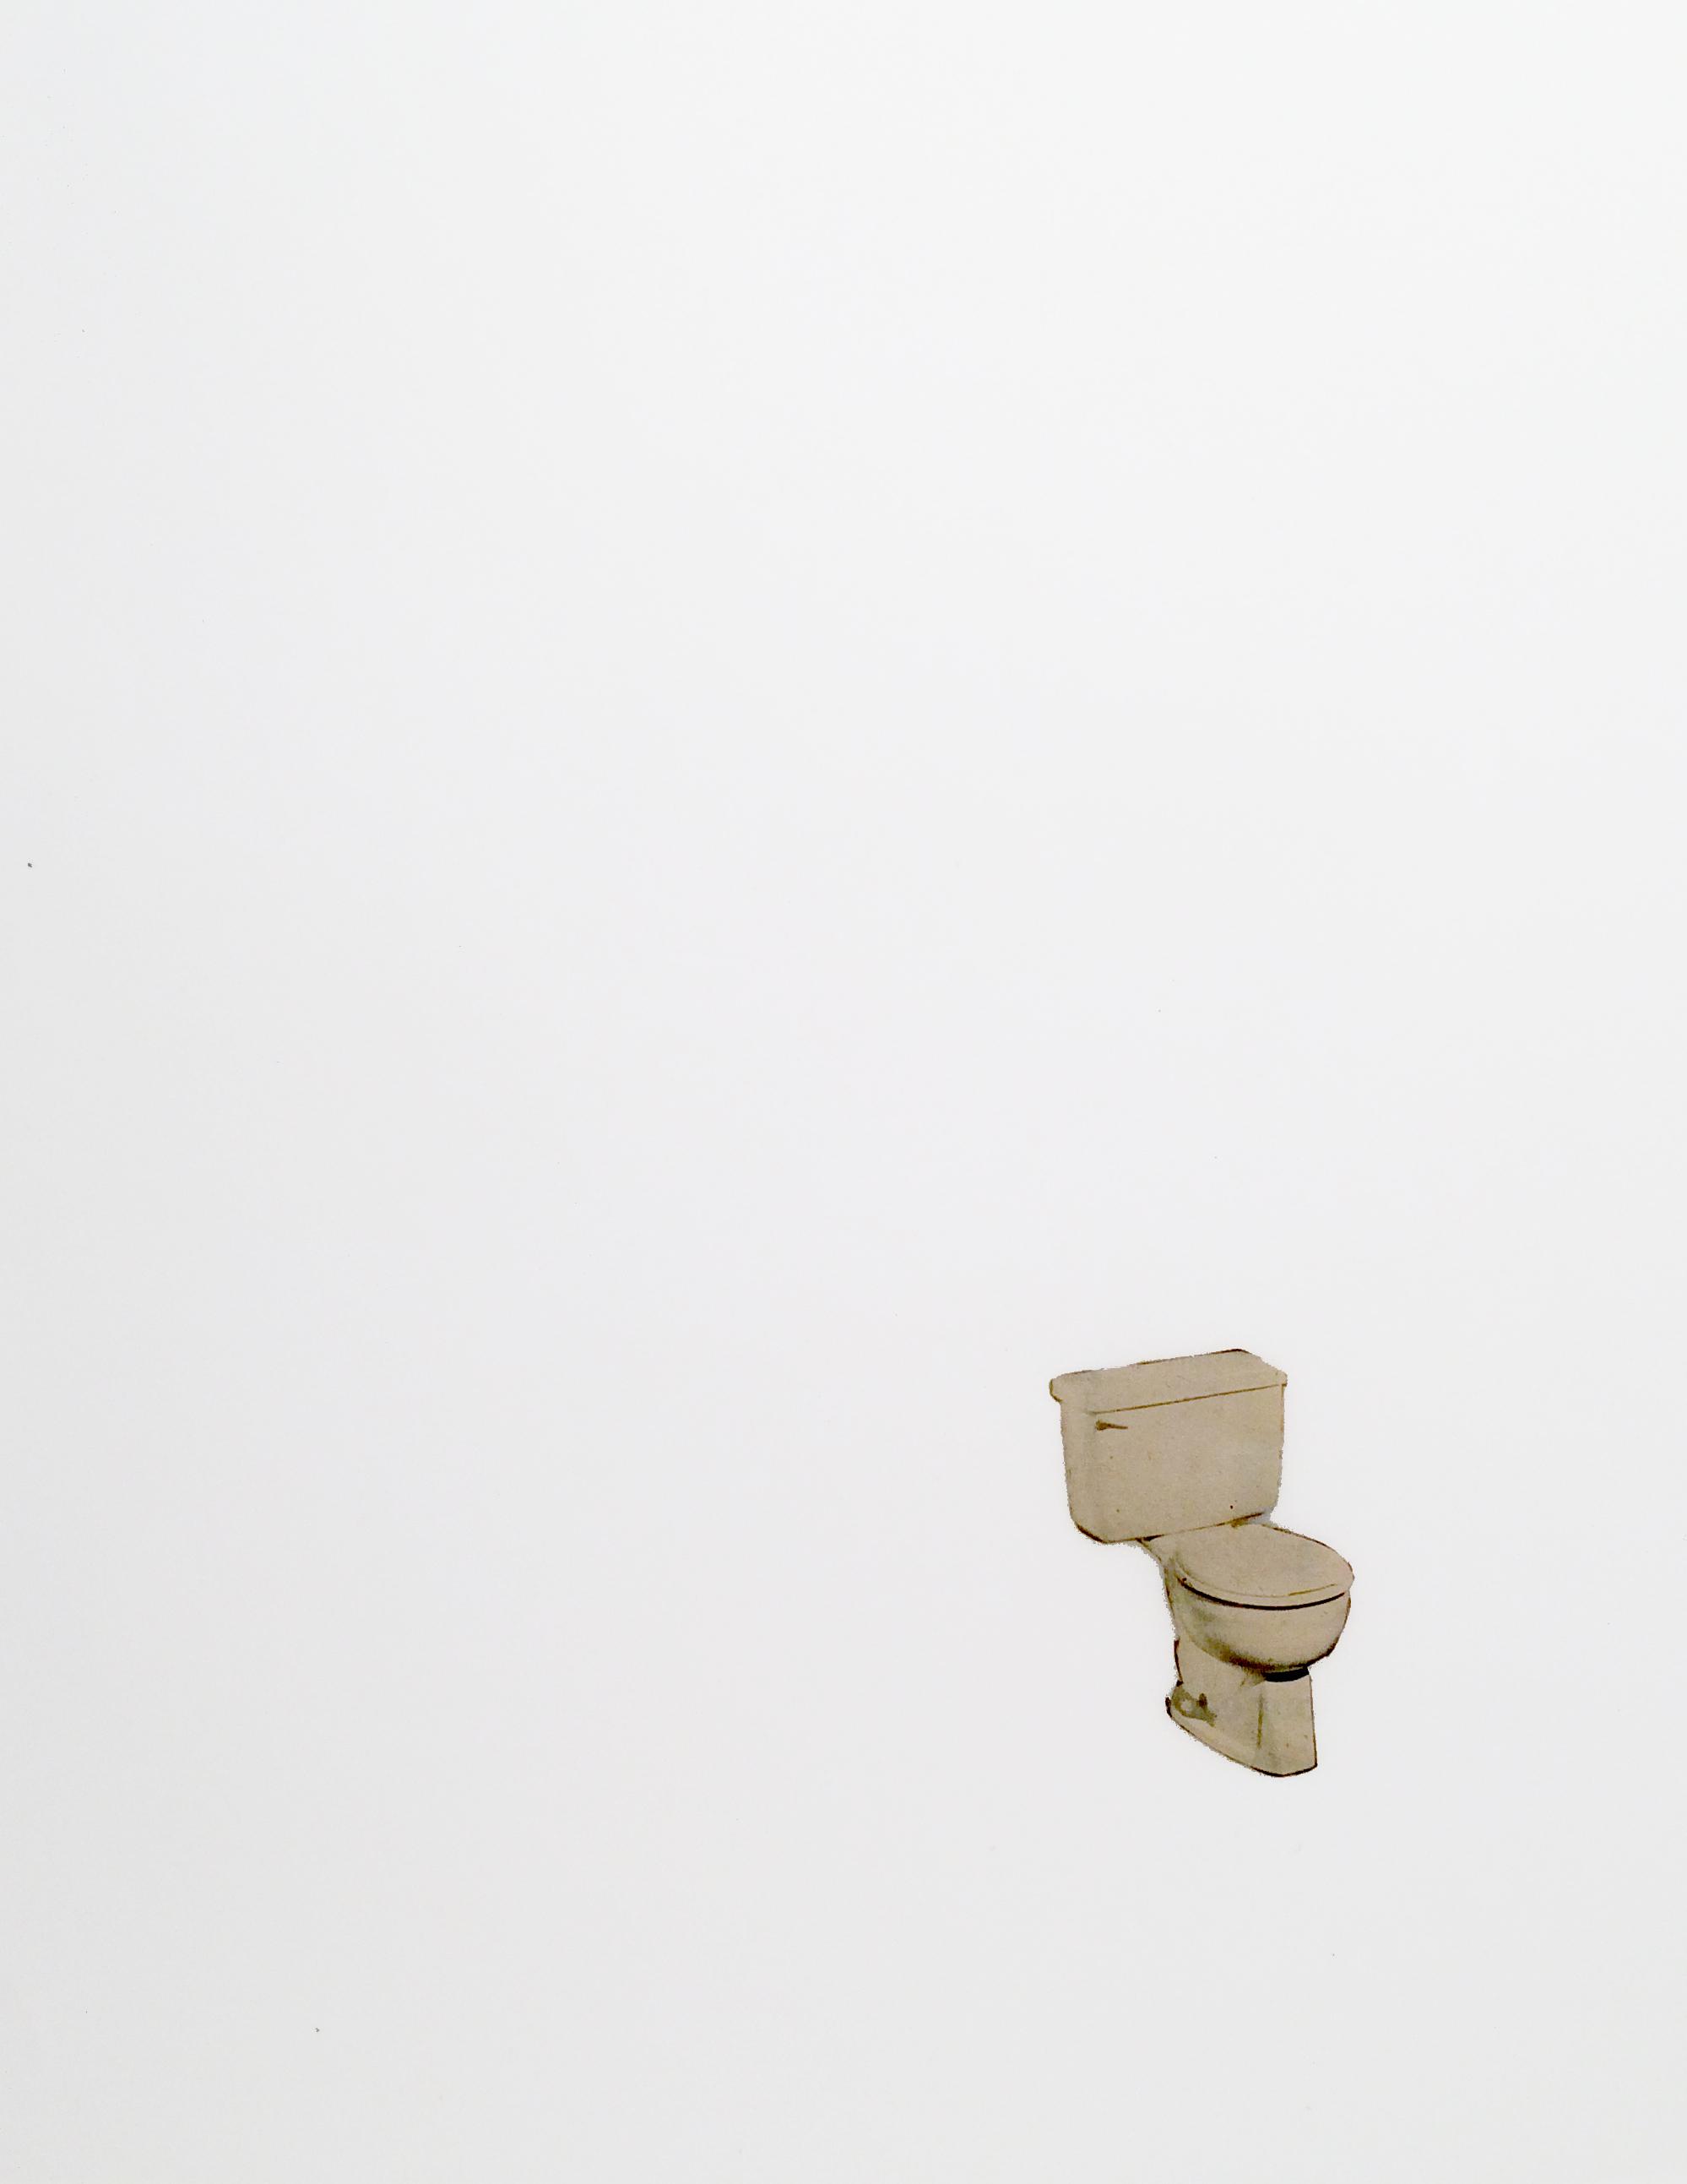 CATALOGUE - Reddimaid ADJUST - duchamp WHT.jpg